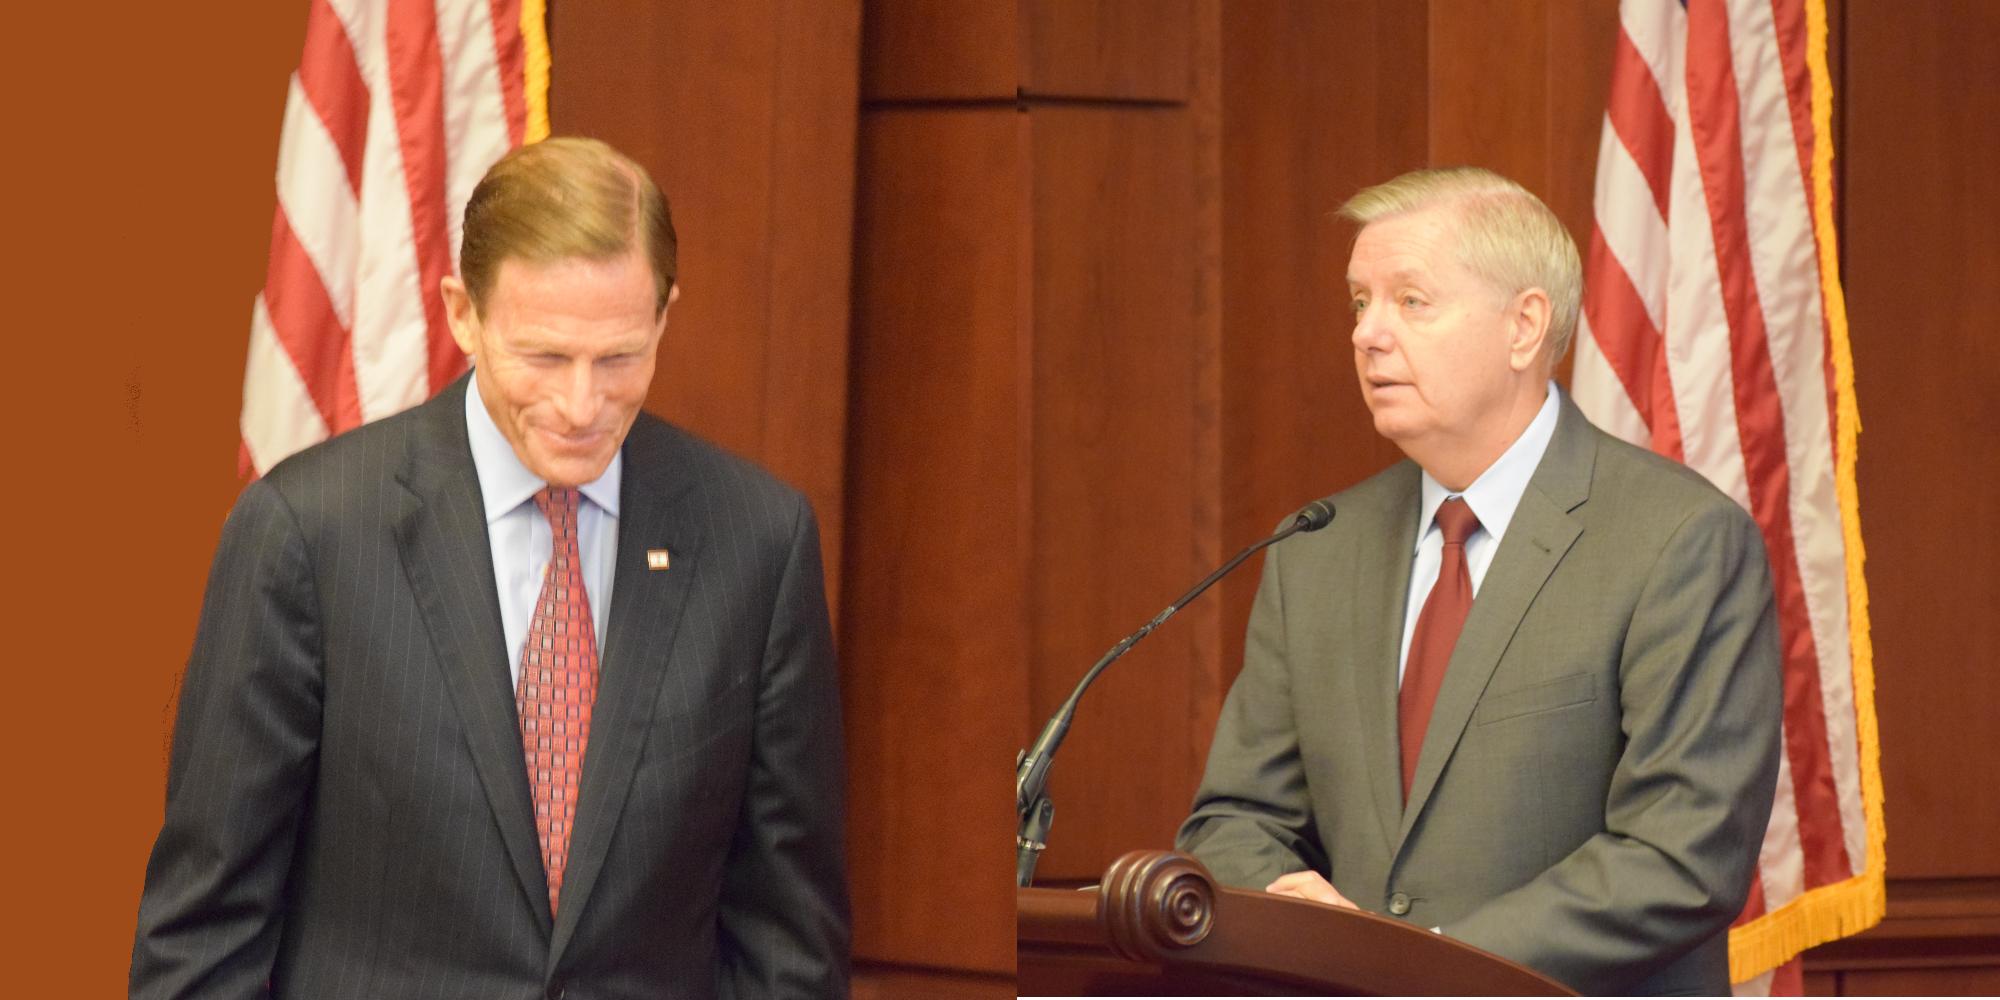 Senators Richard Blumenthal (Left) and Lindsay Graham (Right) Speak at FCHEA Policy Briefing